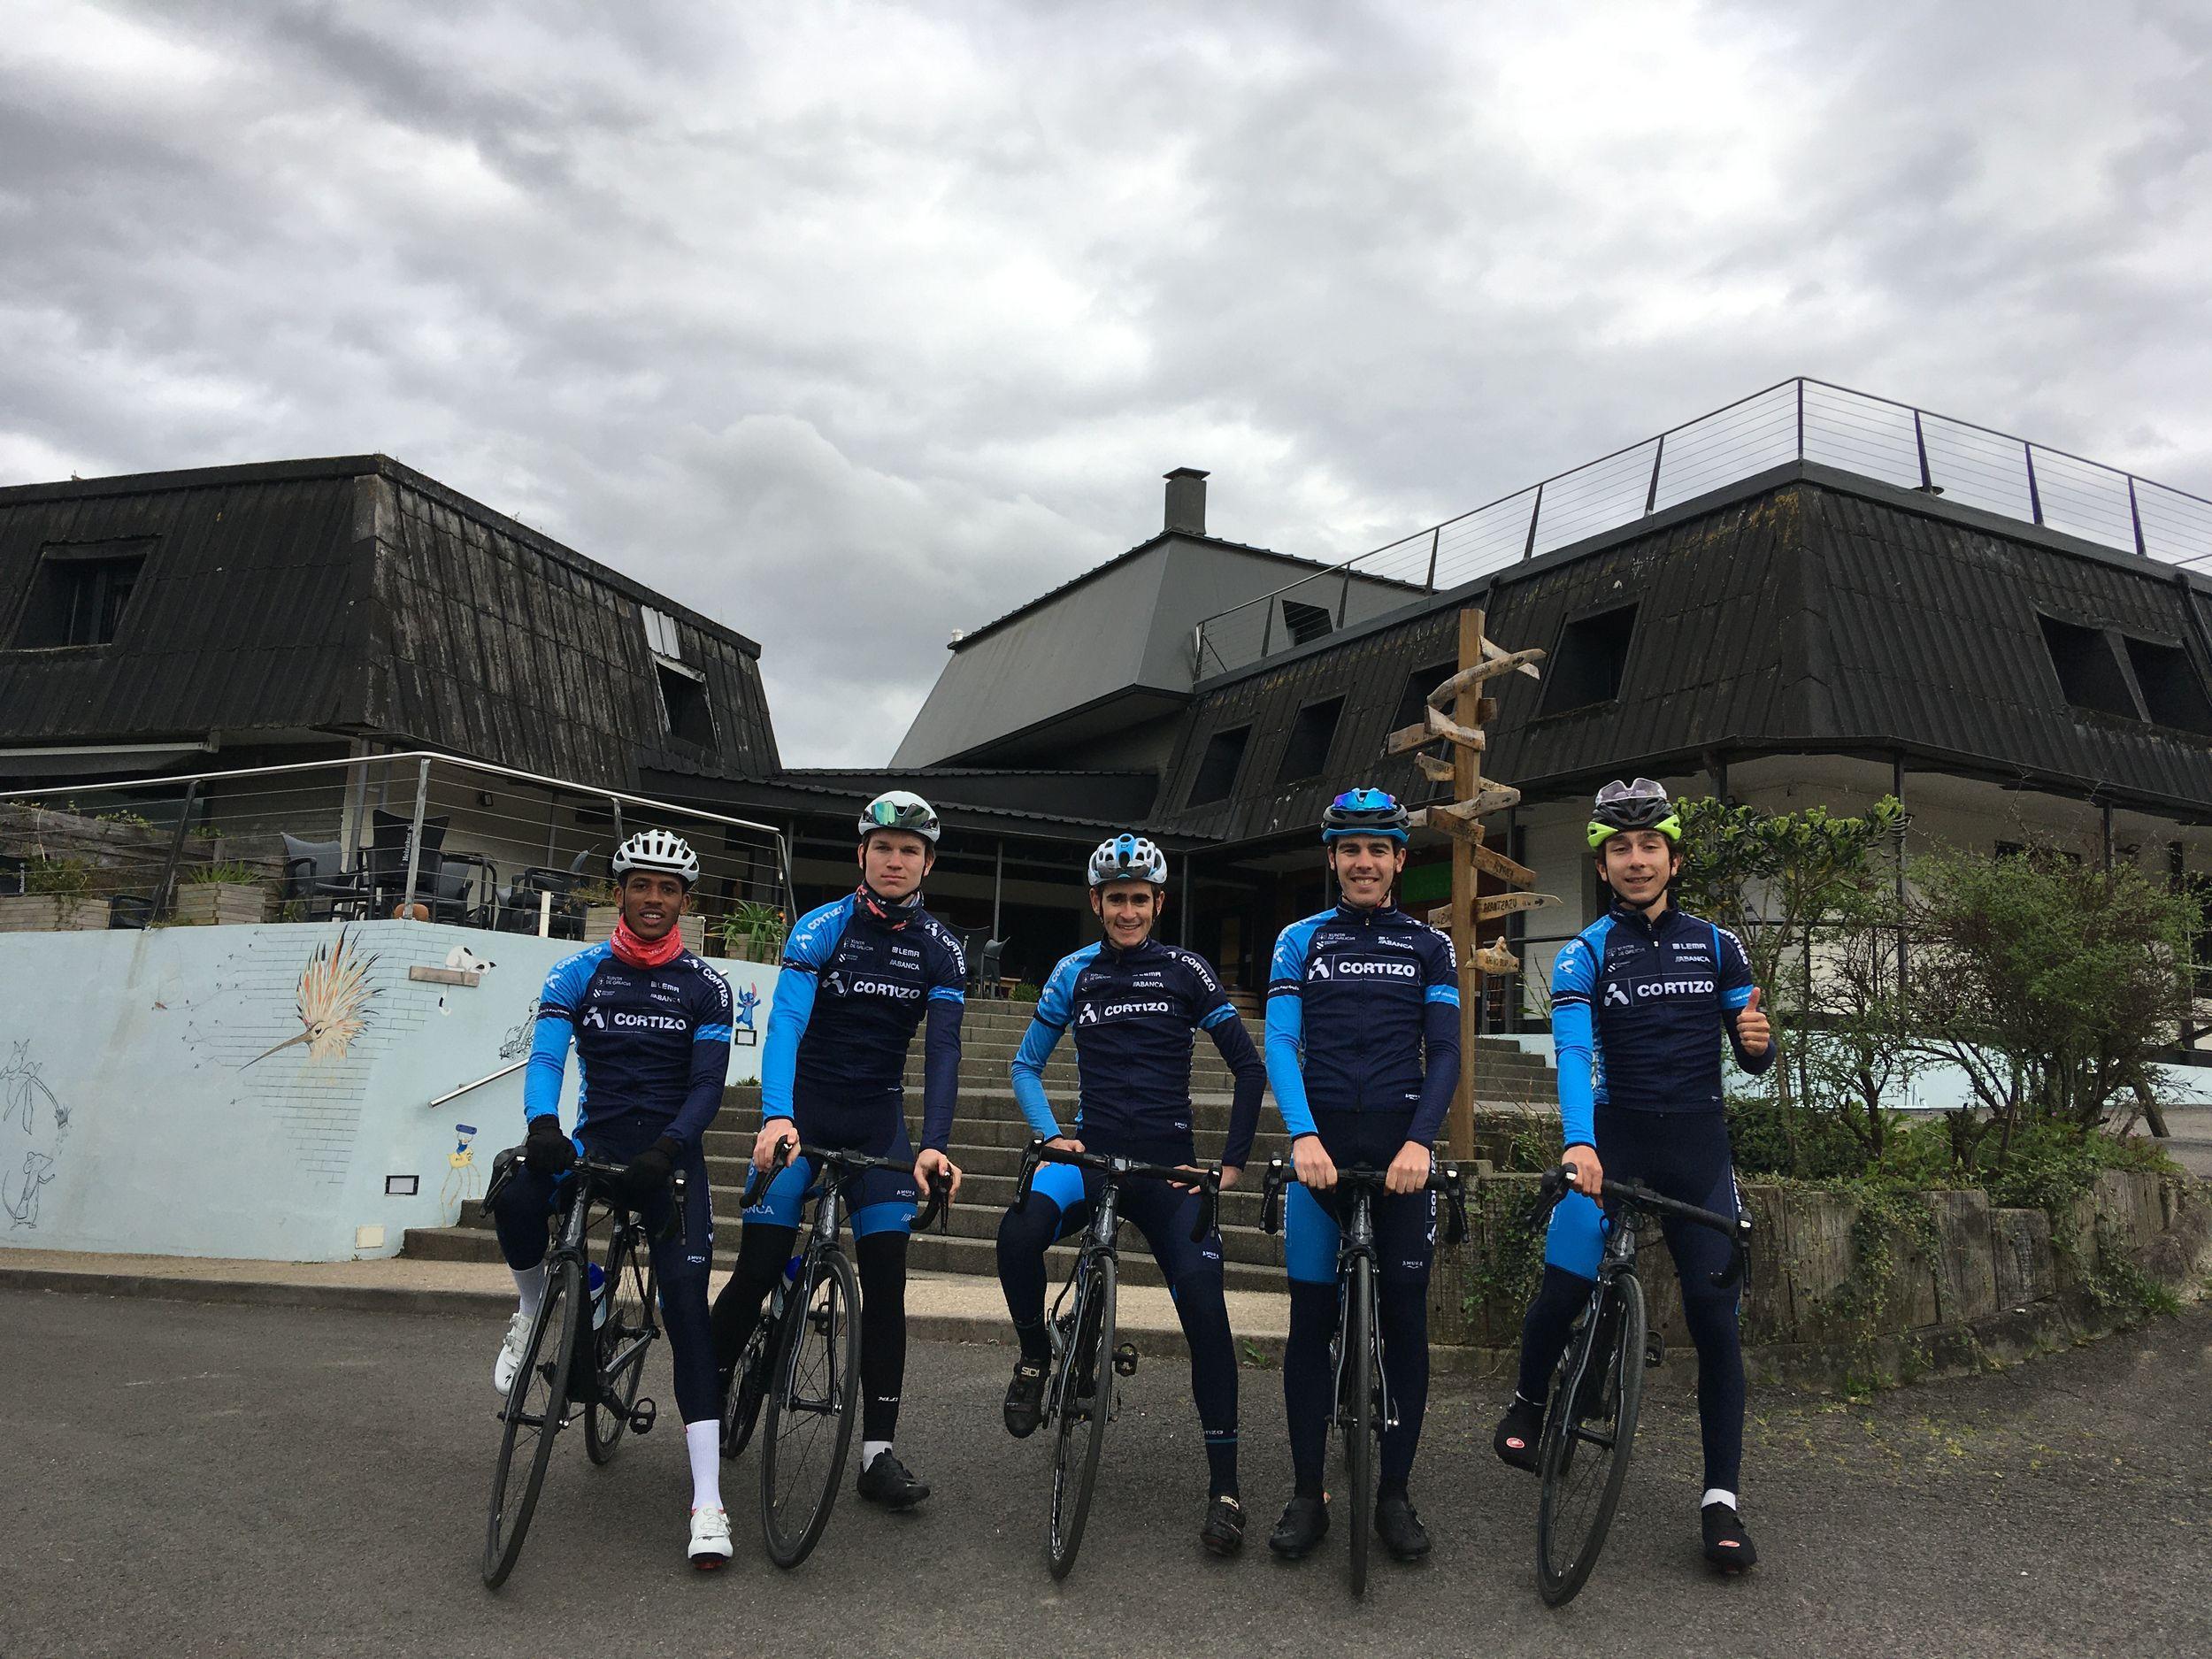 club-ciclista-cortizo-abaraxka-bikefriendly